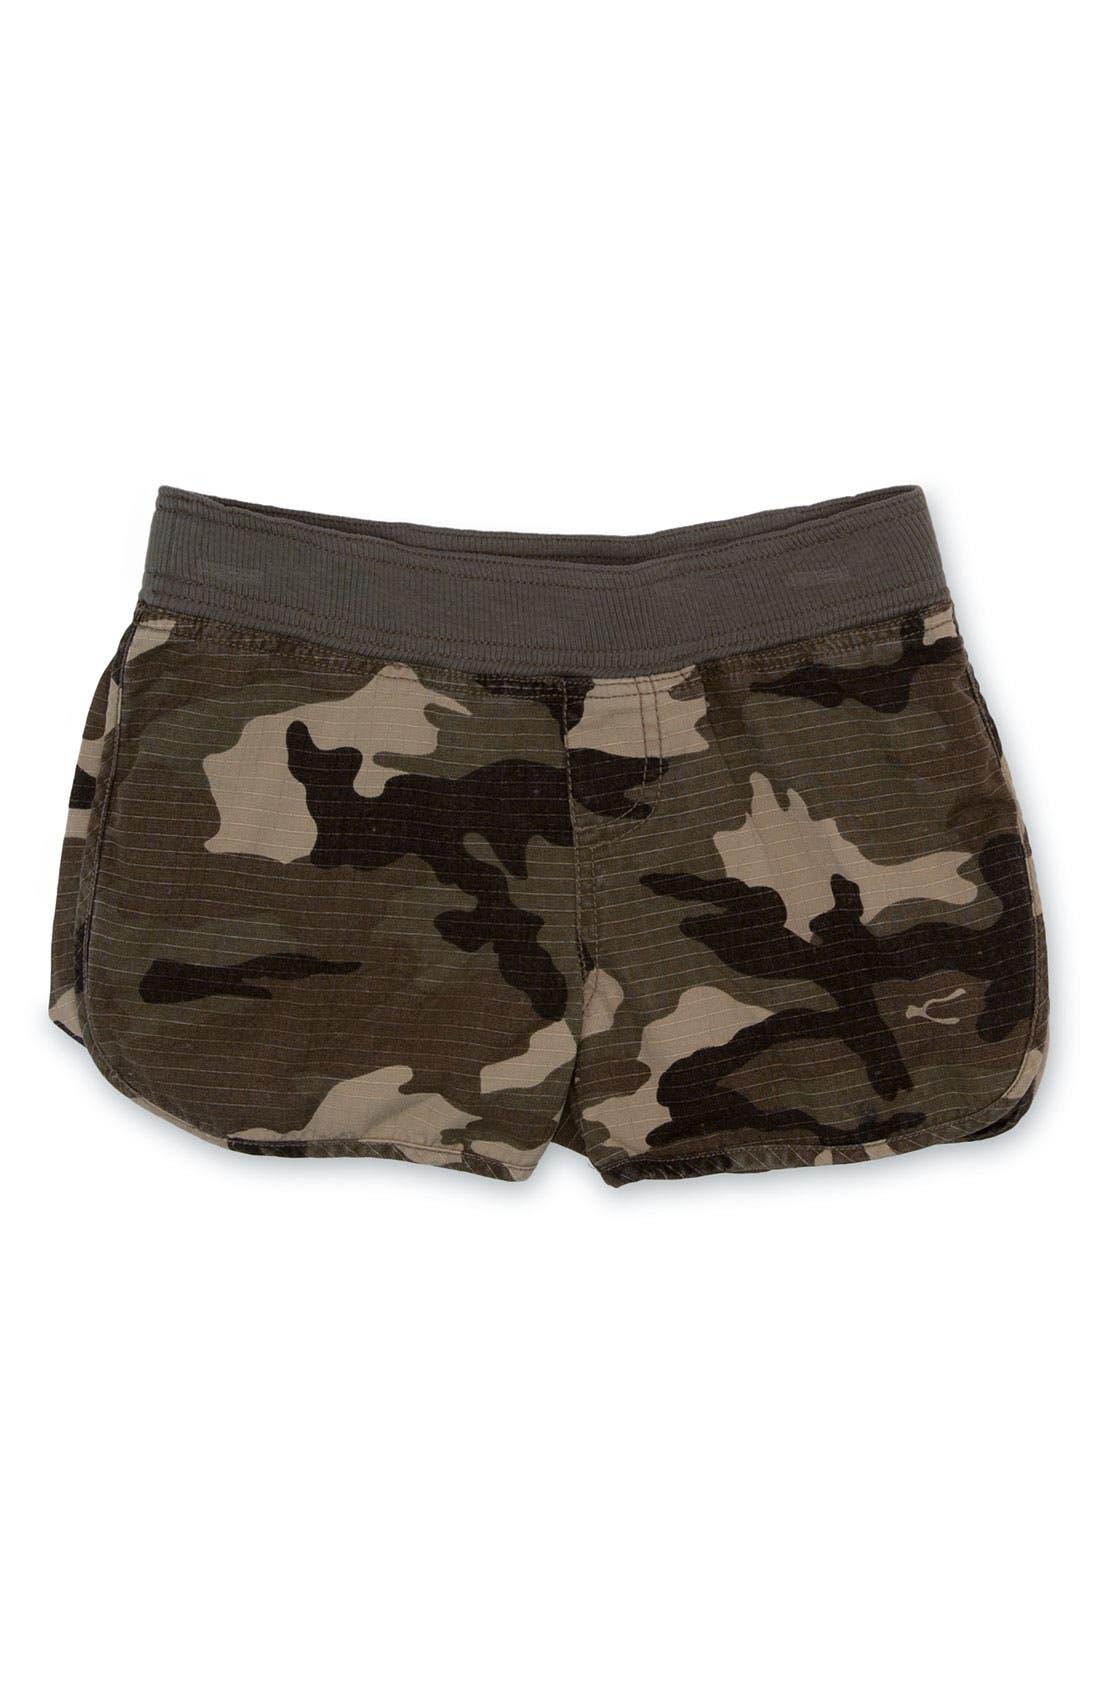 Peek 'Camo' Shorts, Main, color, 301